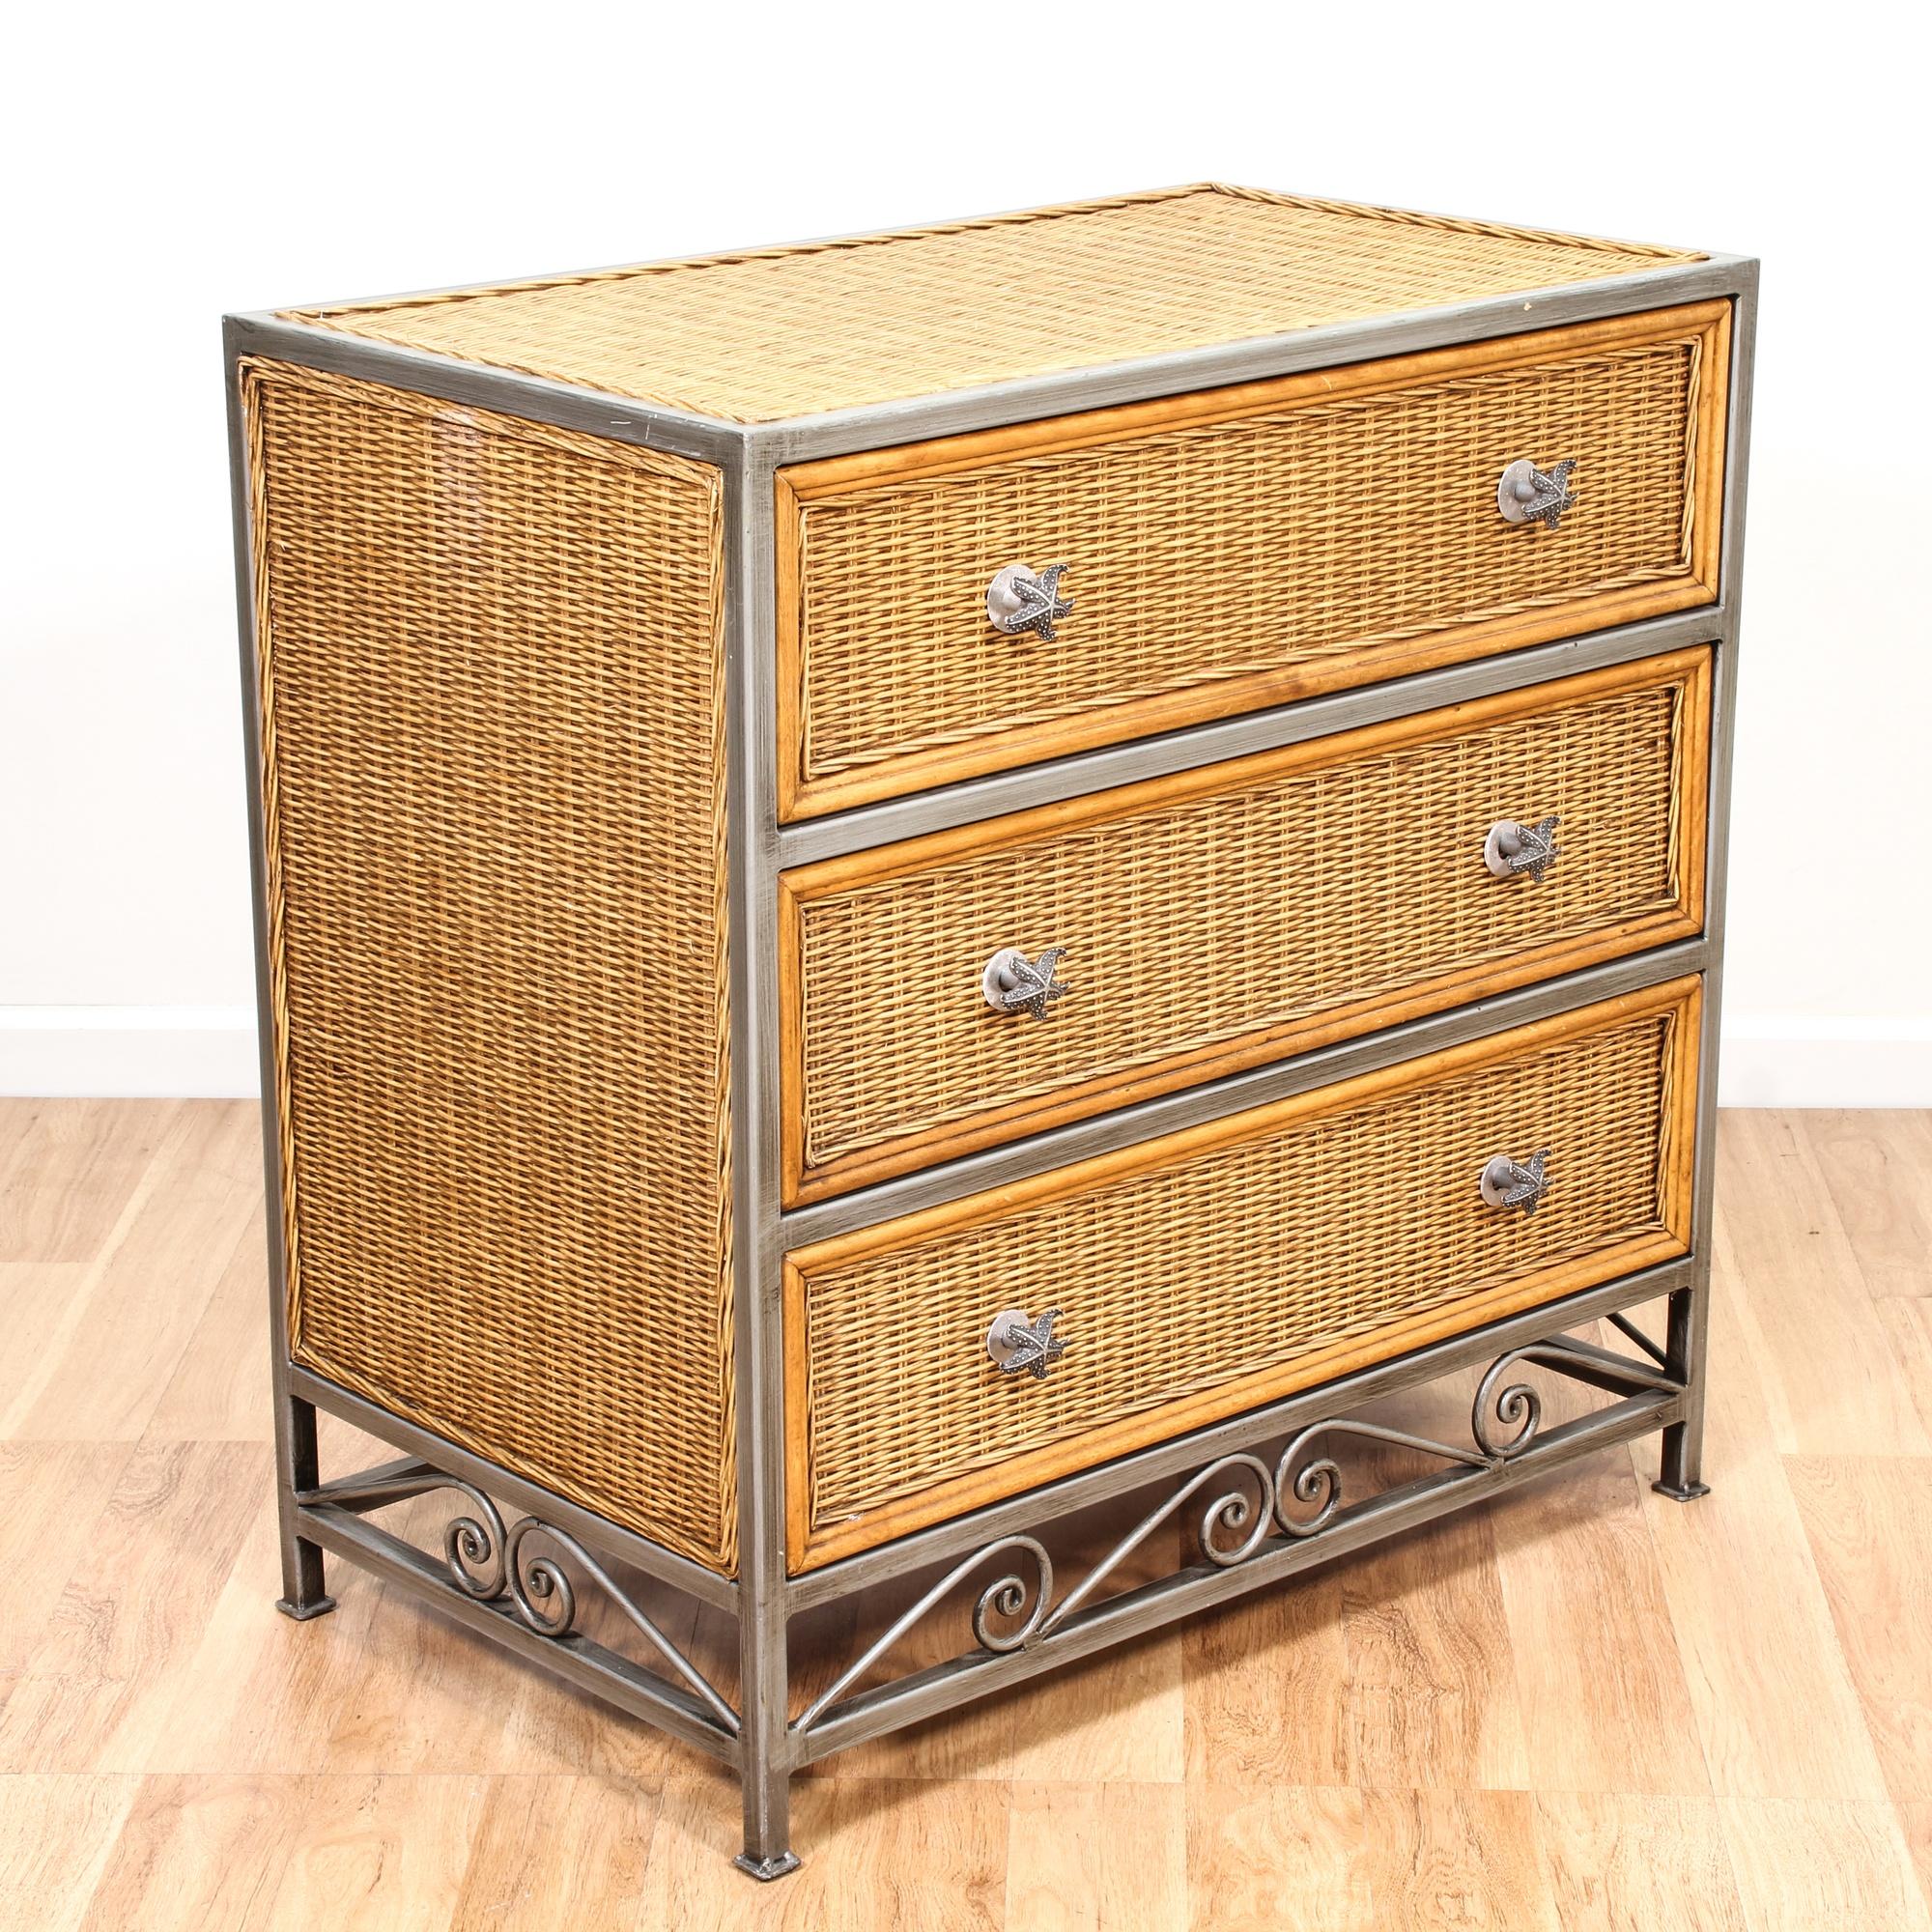 coastal wicker metal chest of drawers loveseat vintage furniture san diego los angeles. Black Bedroom Furniture Sets. Home Design Ideas